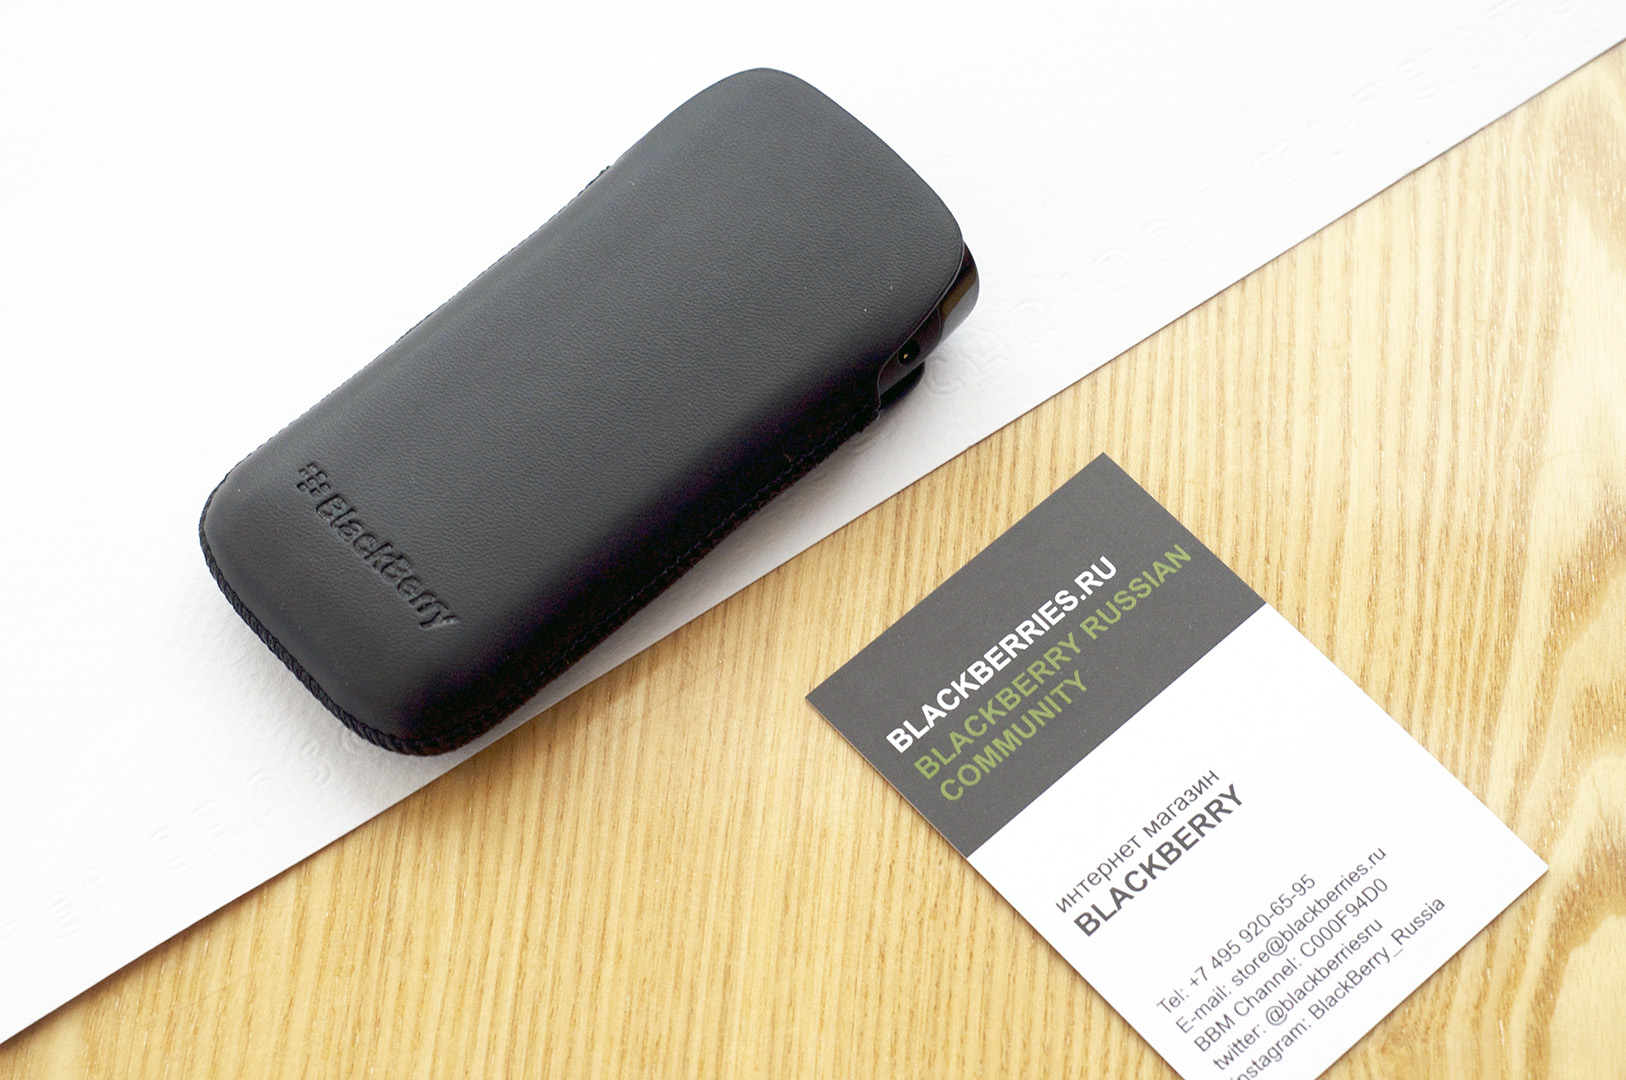 blackberry-9100-pearl-3g-11